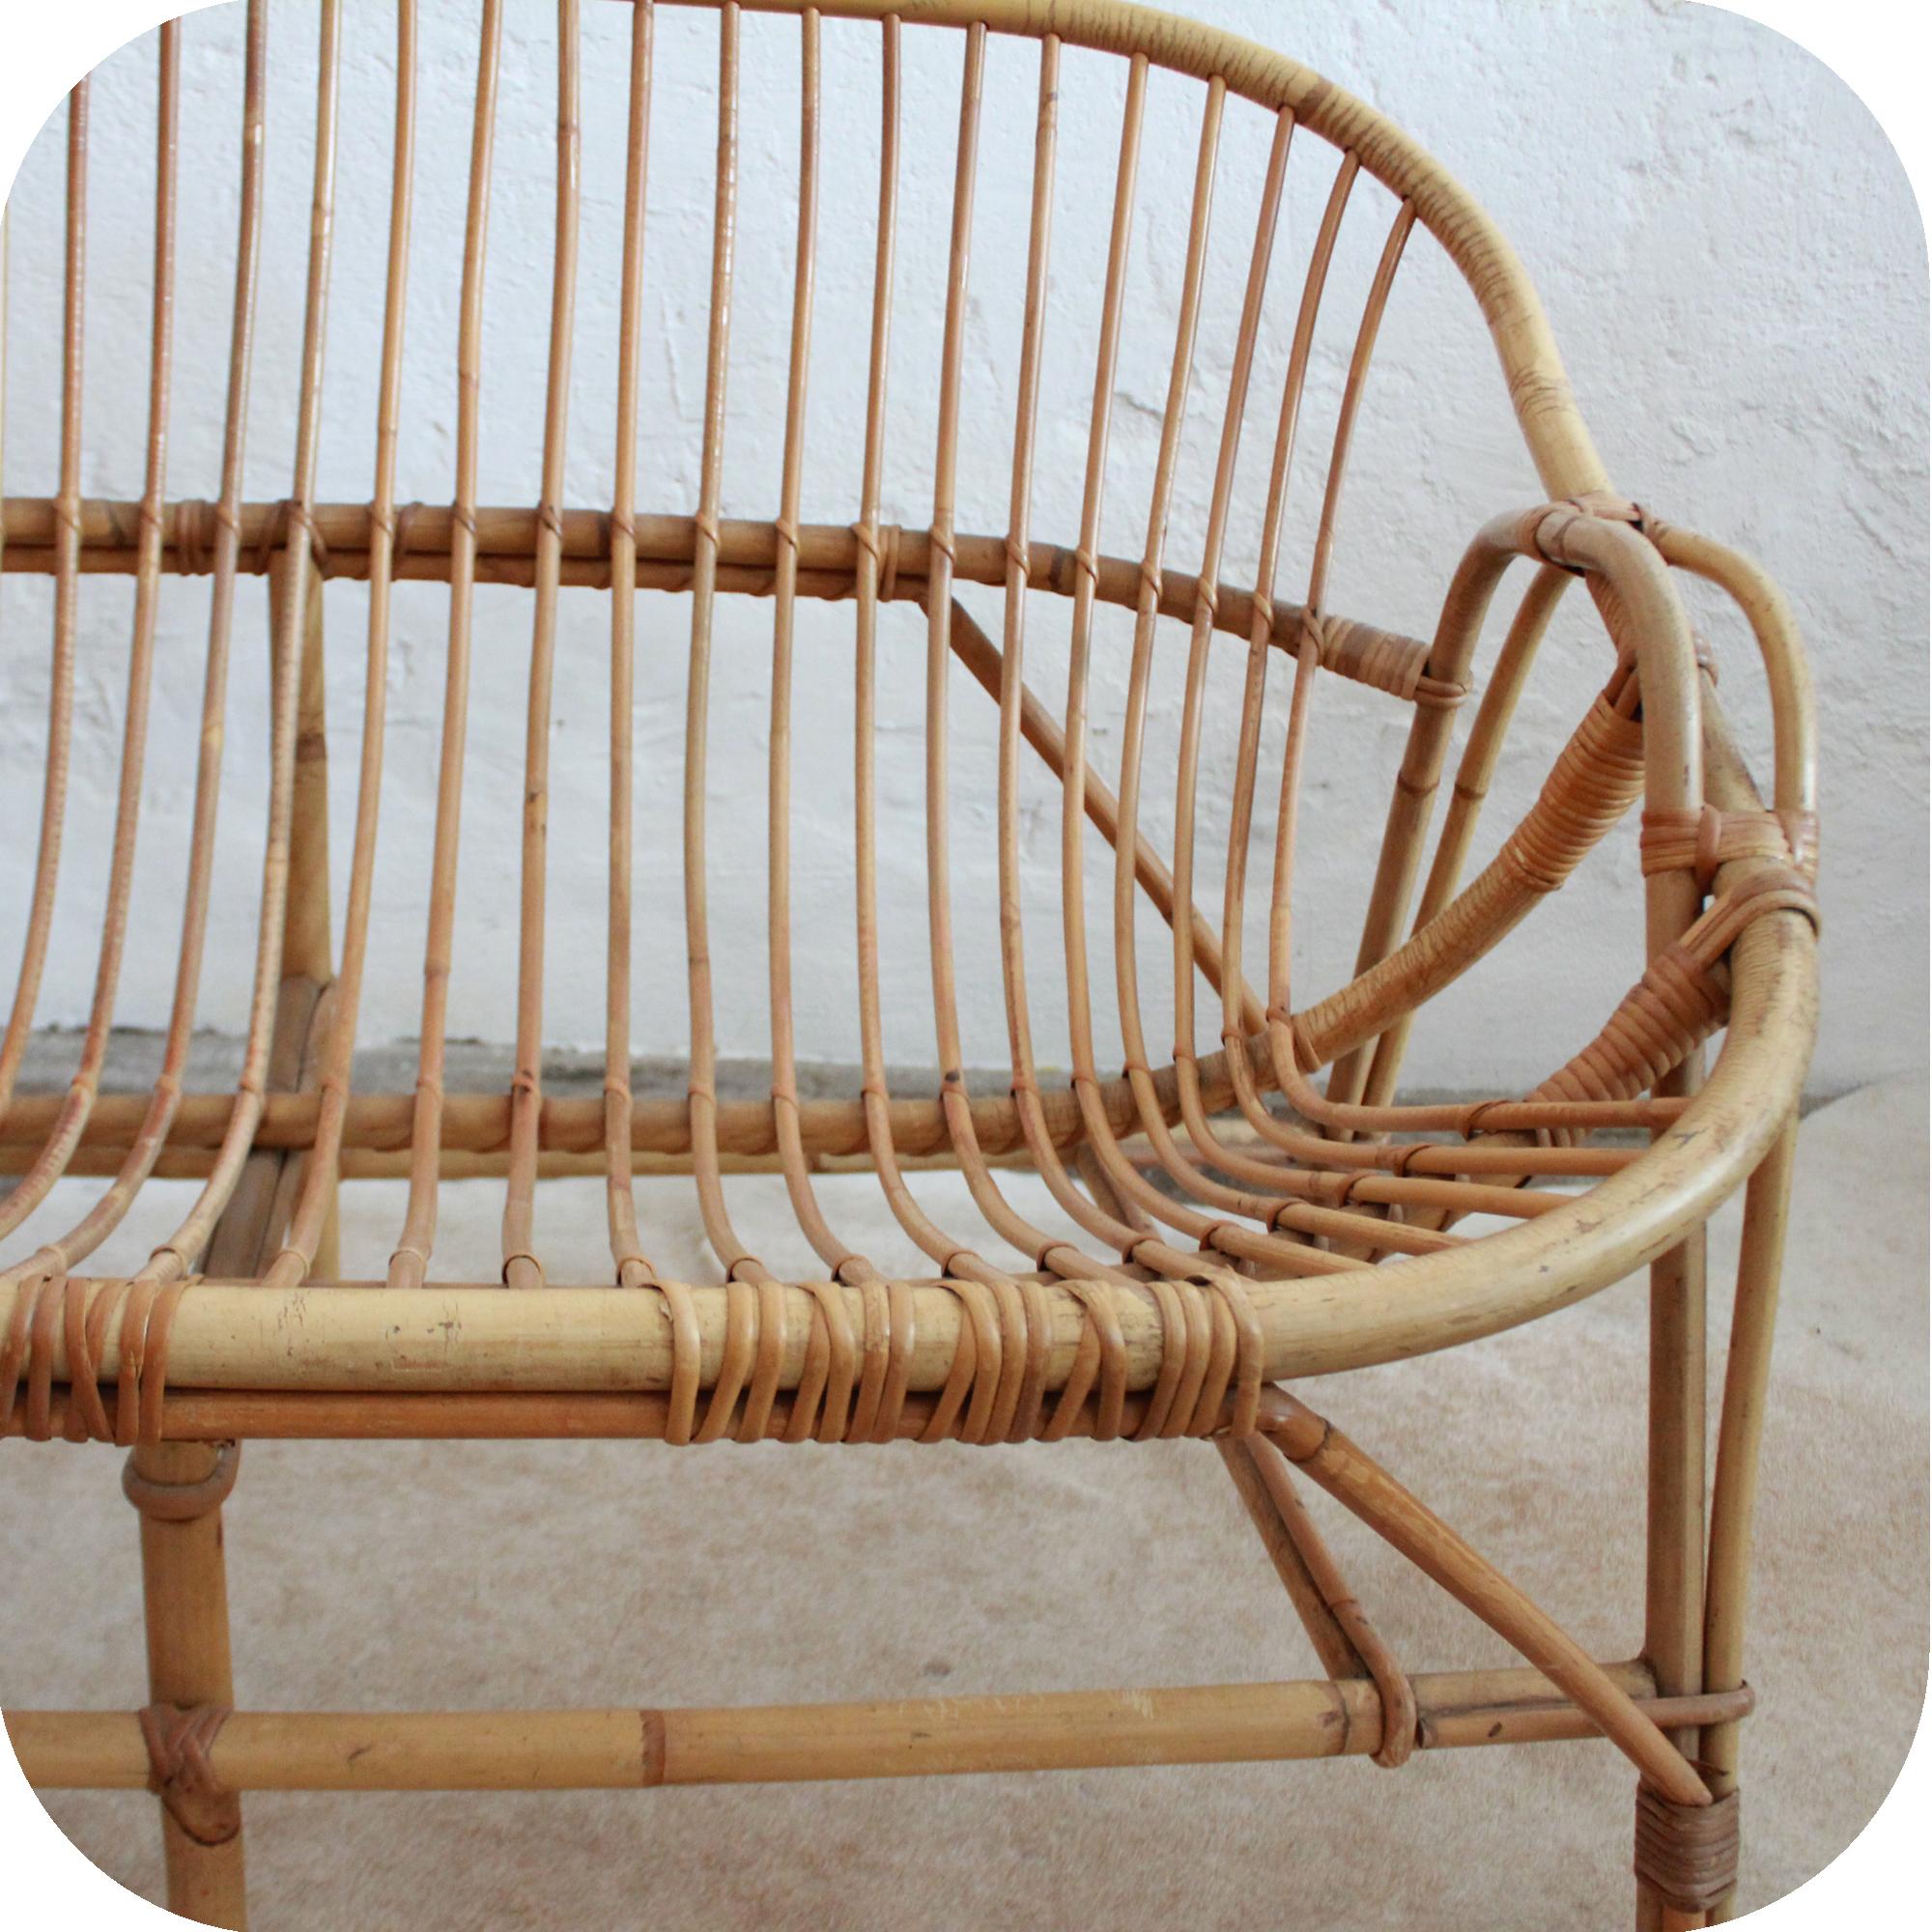 d546 mobilier vintage banquette canap vintage rotin e. Black Bedroom Furniture Sets. Home Design Ideas